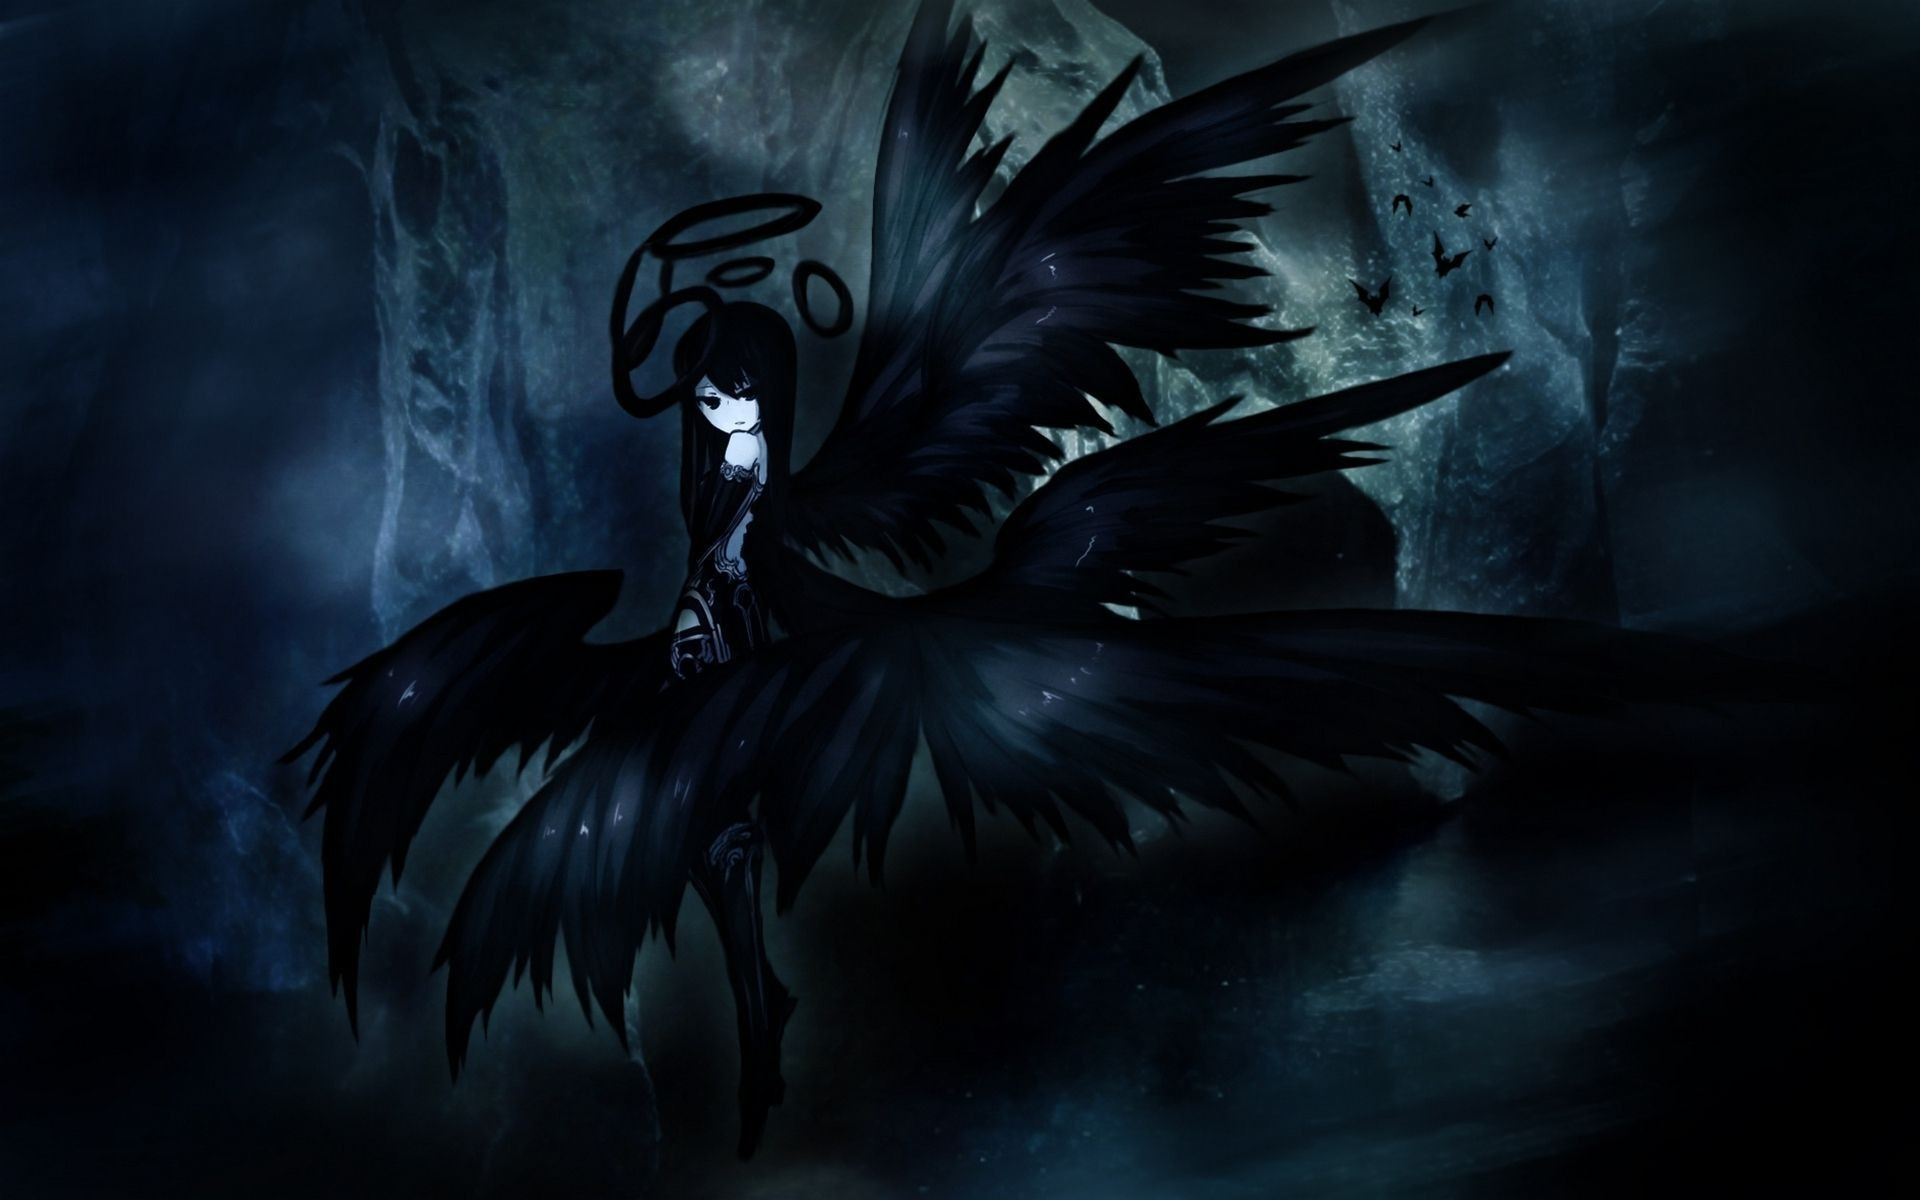 Dark Angel Wallpapers (47+ images)